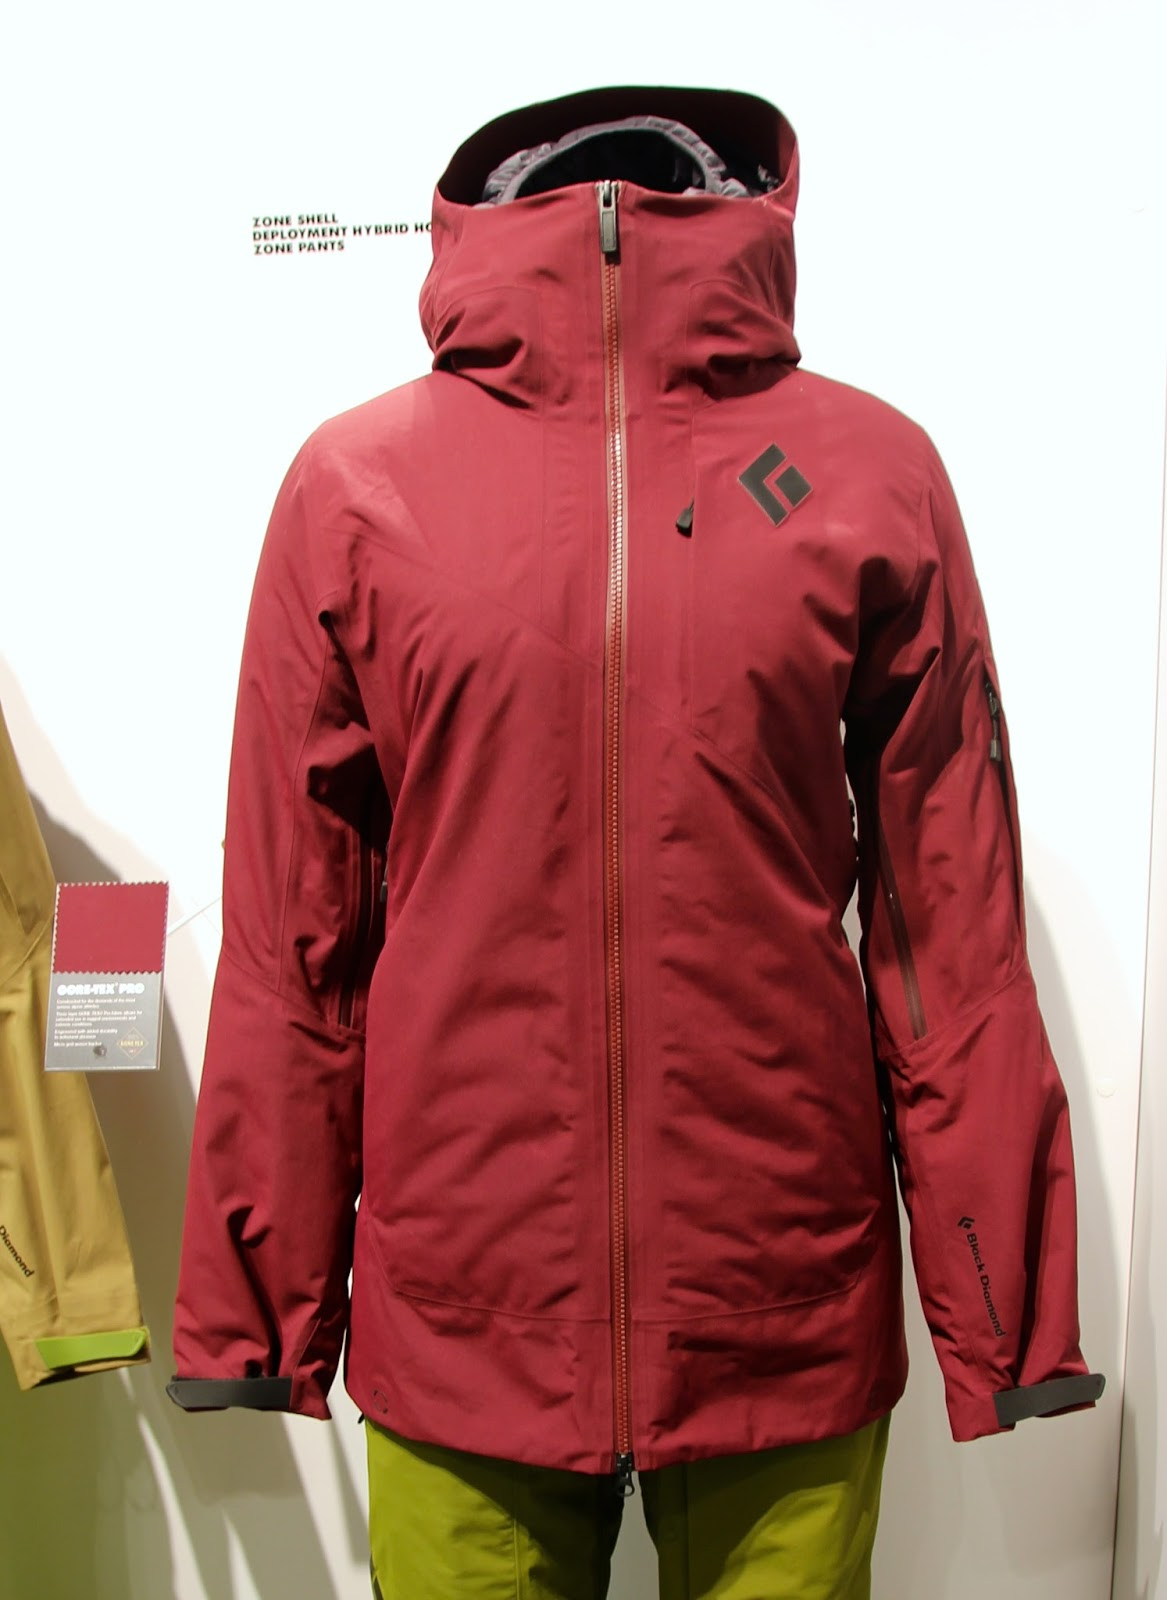 1221403c213 Black Diamond women s Zone Shell  649.00 (w Zone Pants  499.00)for women---in  Merlot. Gore-Tex® 2L top-of-the-line ski jacket insulated w  Primaloft®  Silver ...